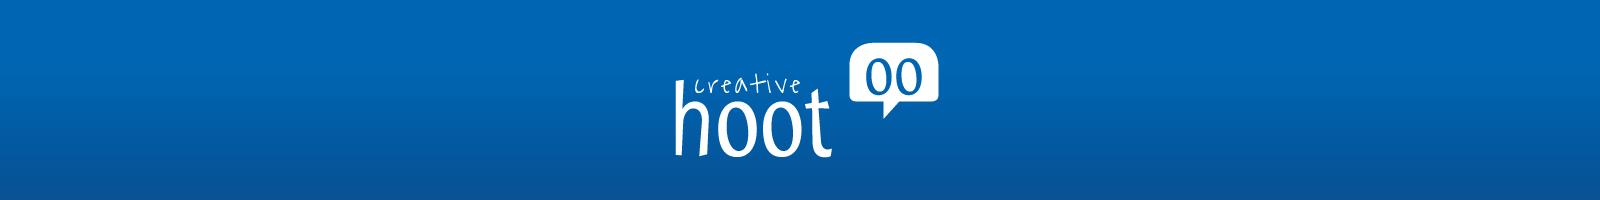 Creative Hoot – Inspiring Creativity | Design & Marketing Agency based in Cumbria